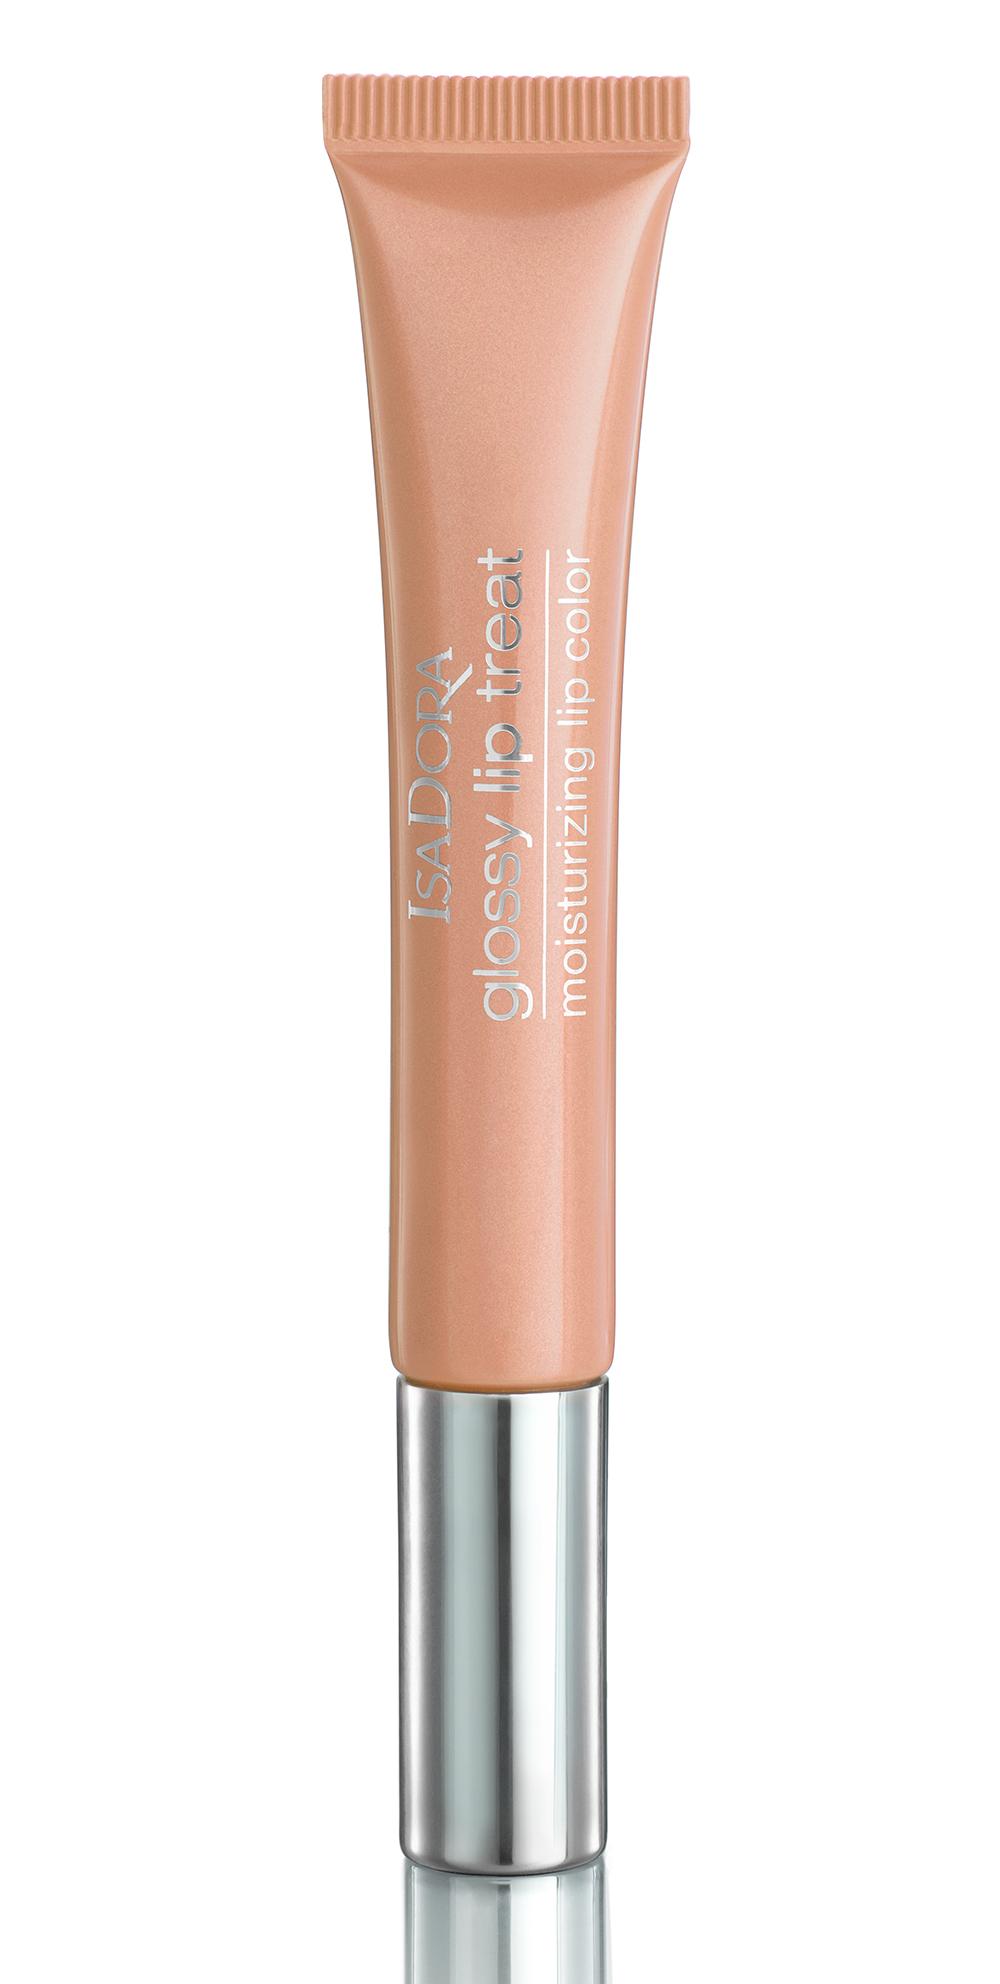 IsaDora Nude Vivacity 65 Glossy Lip Treat Bronzing Collection 2020